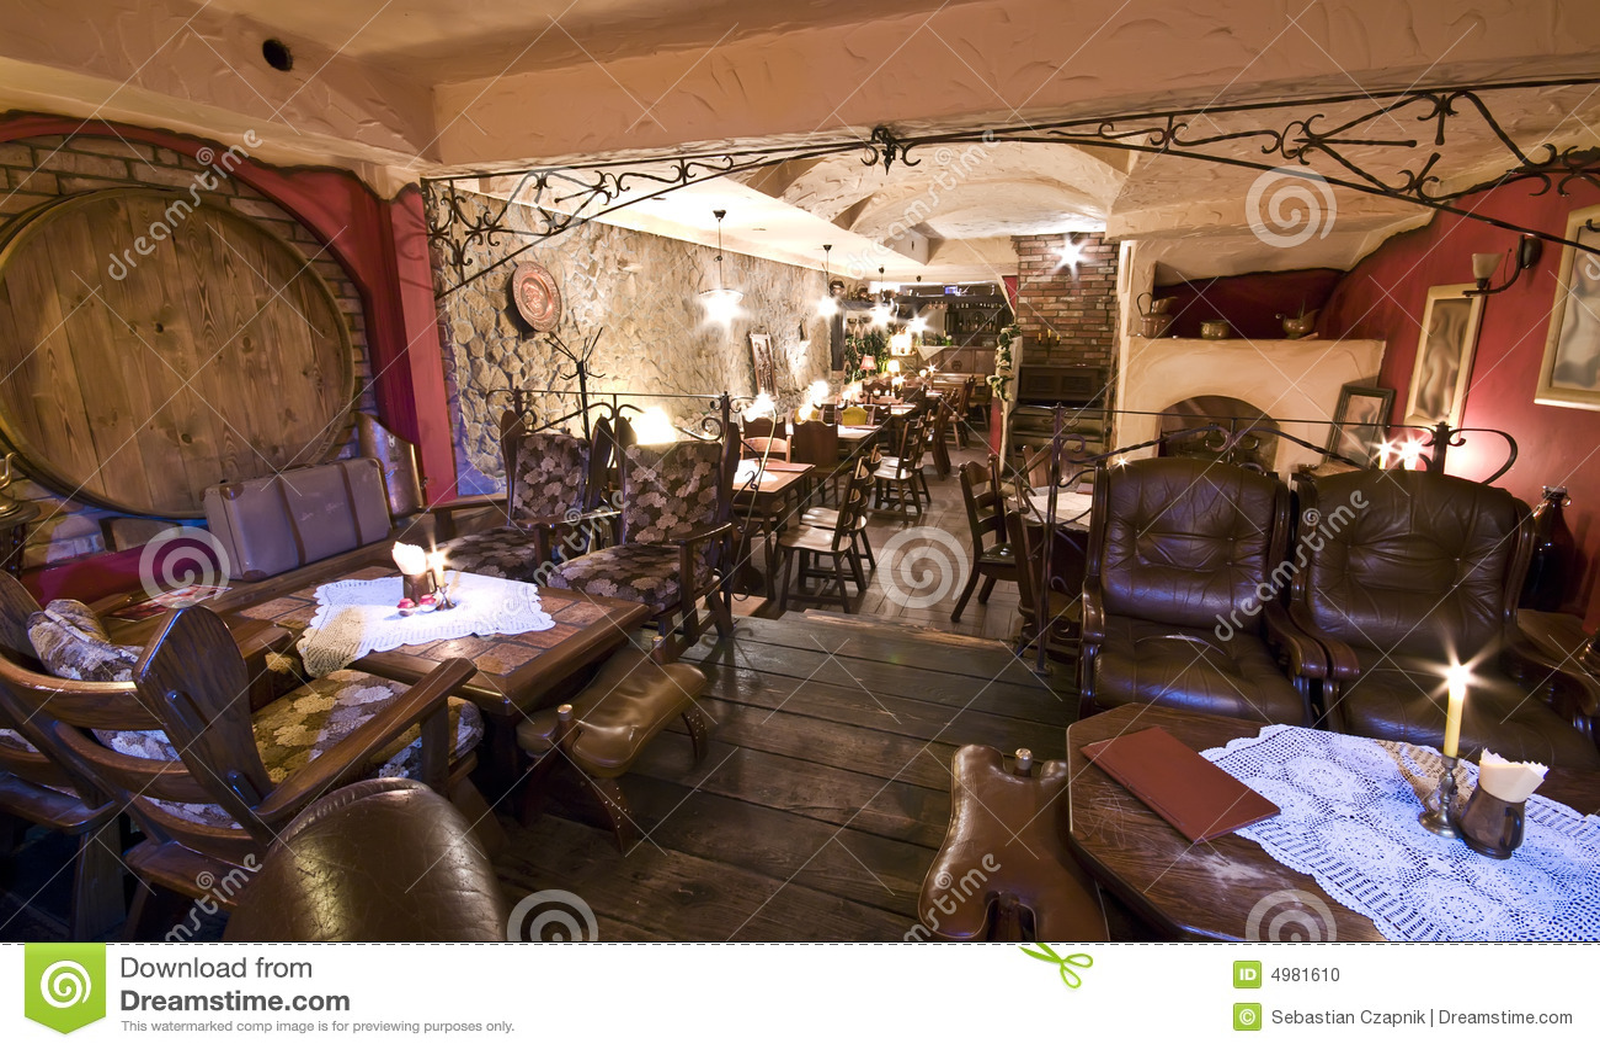 basement restaurant stock photo image 4981610